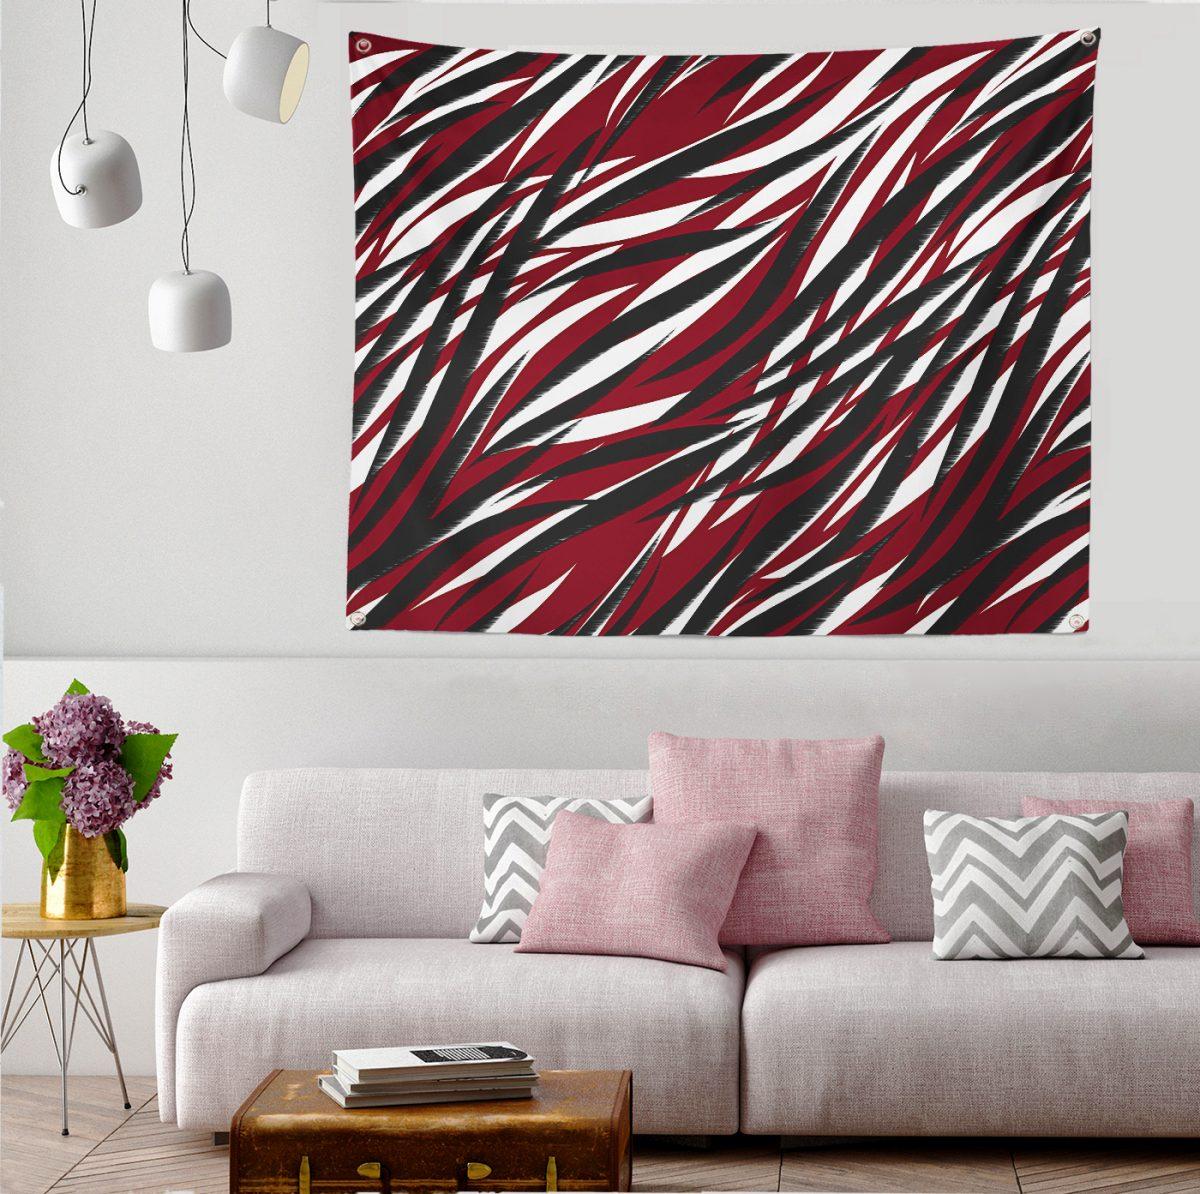 Modern Rüzgar Esintisi Özel Tasarım Tapestry Duvar Örtüsü Realhomes